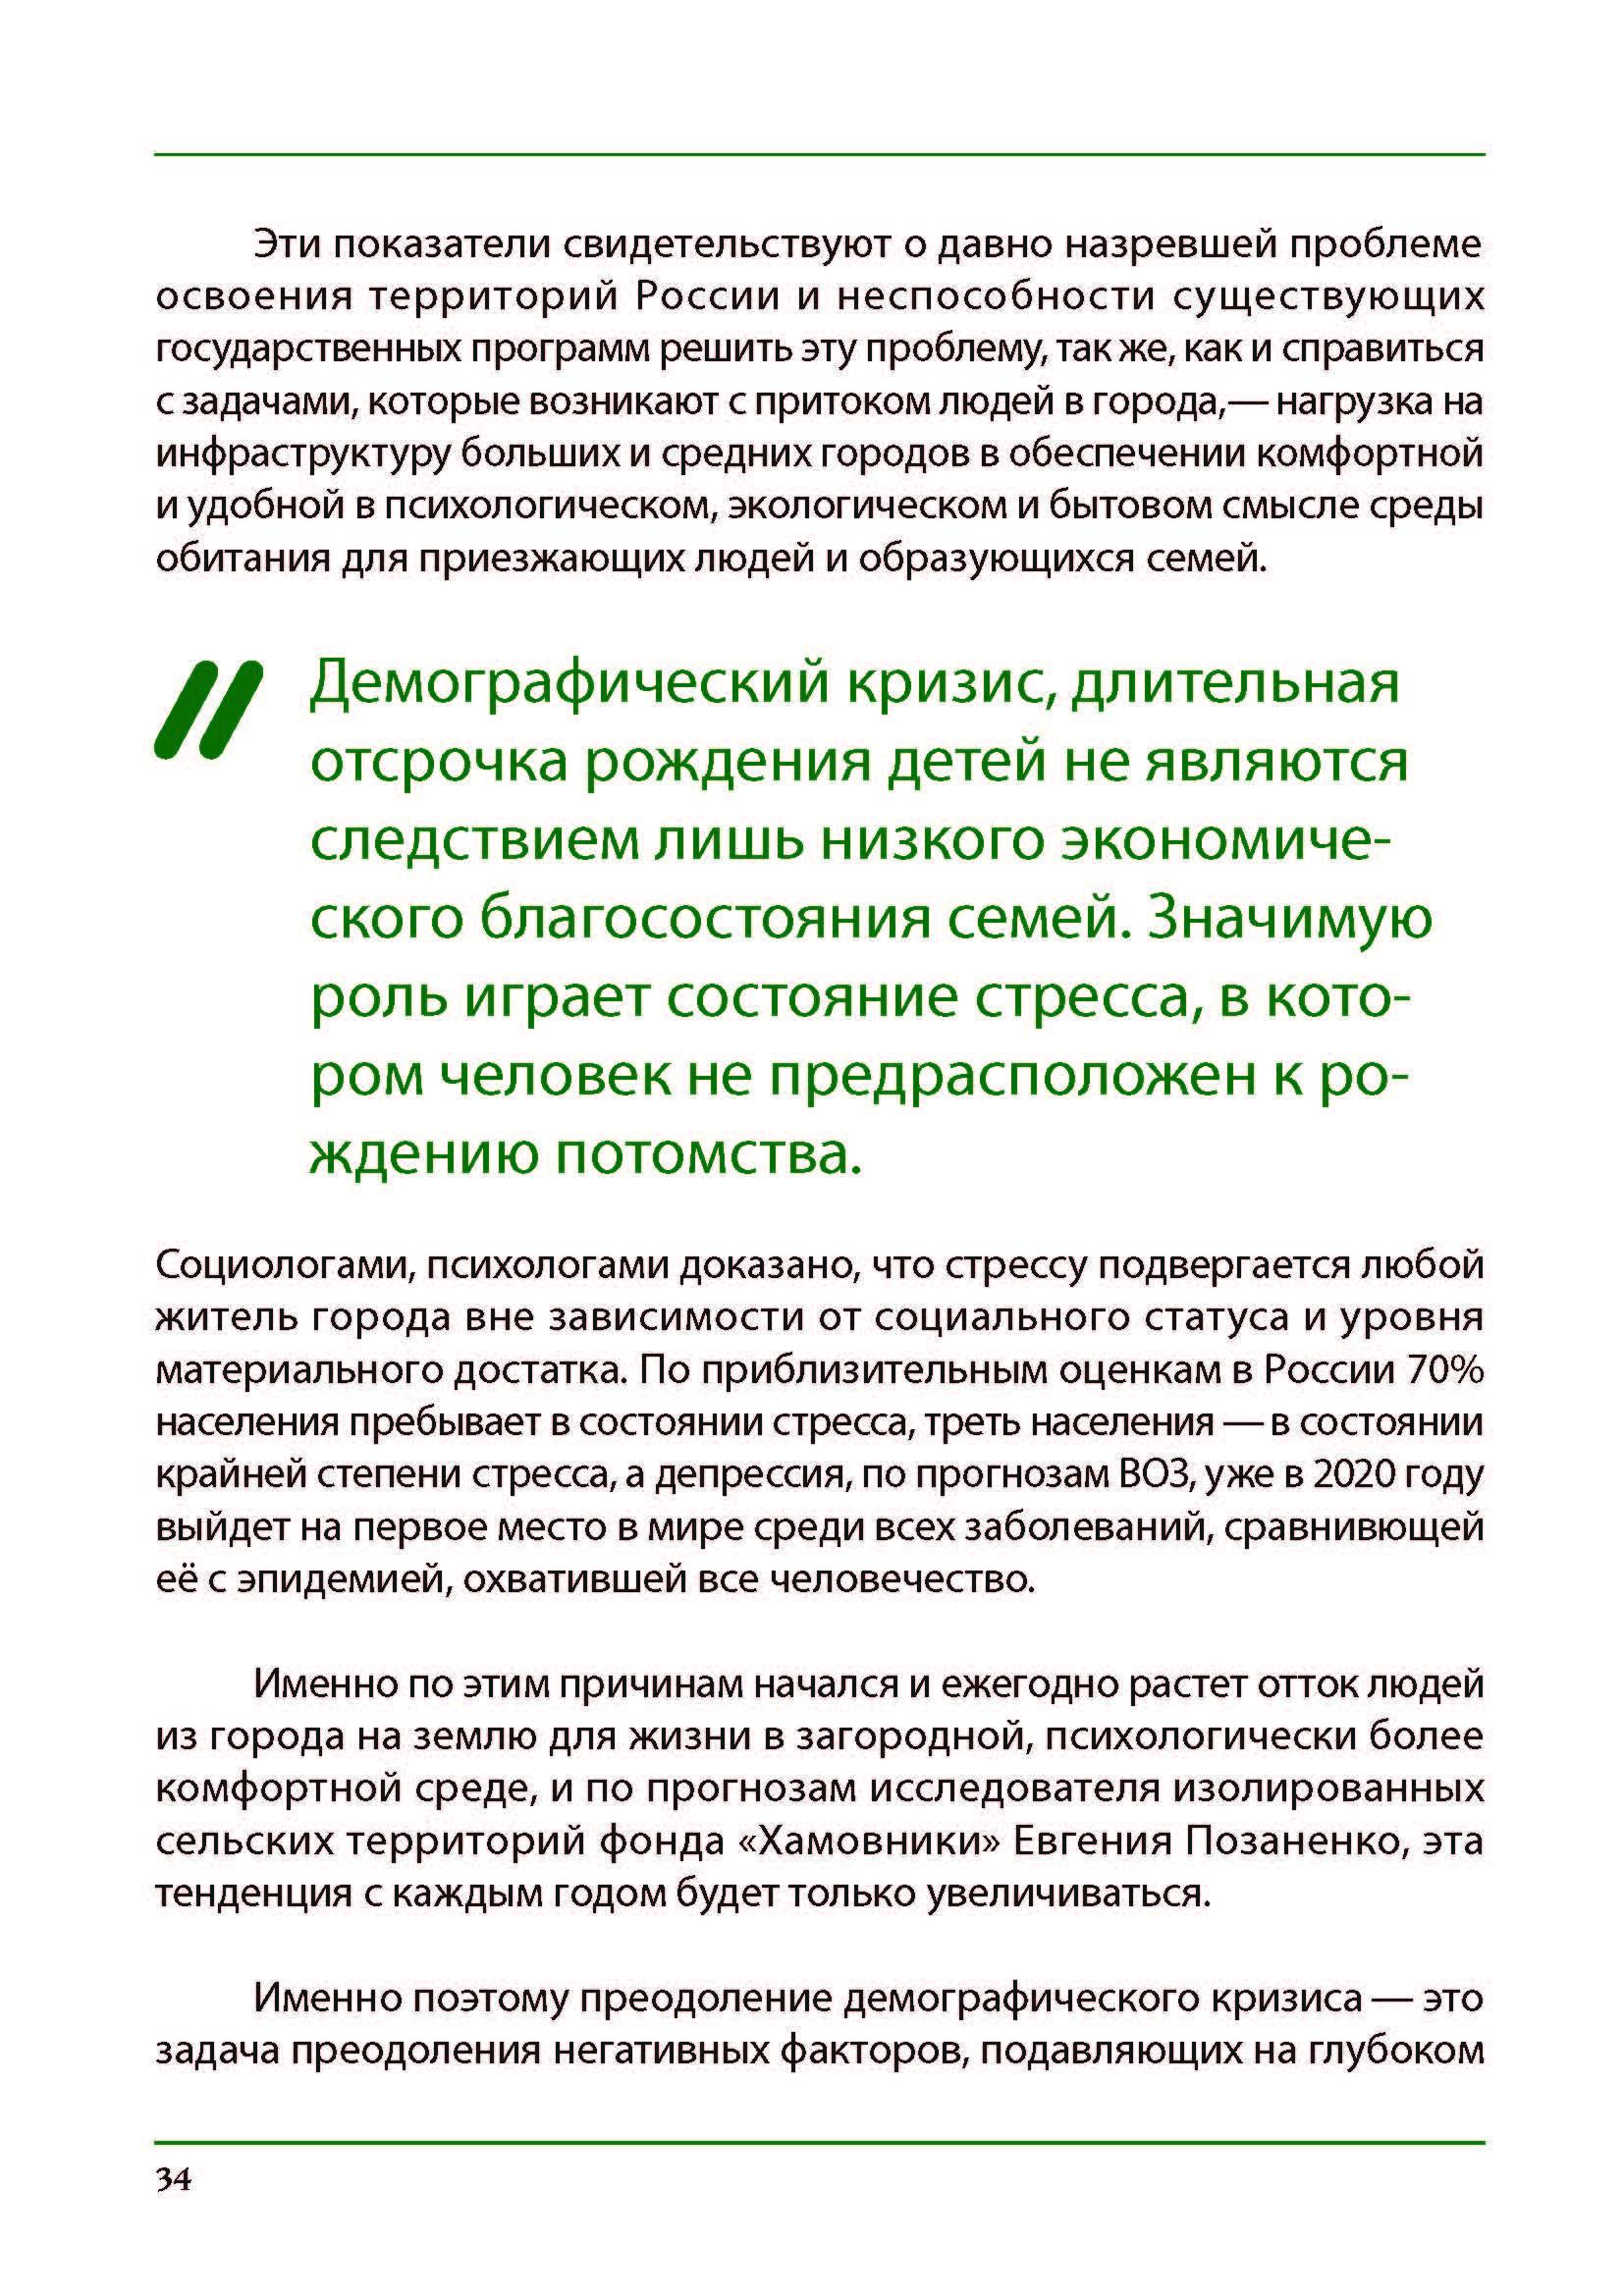 Фонд Поправка Конституция (34).jpg